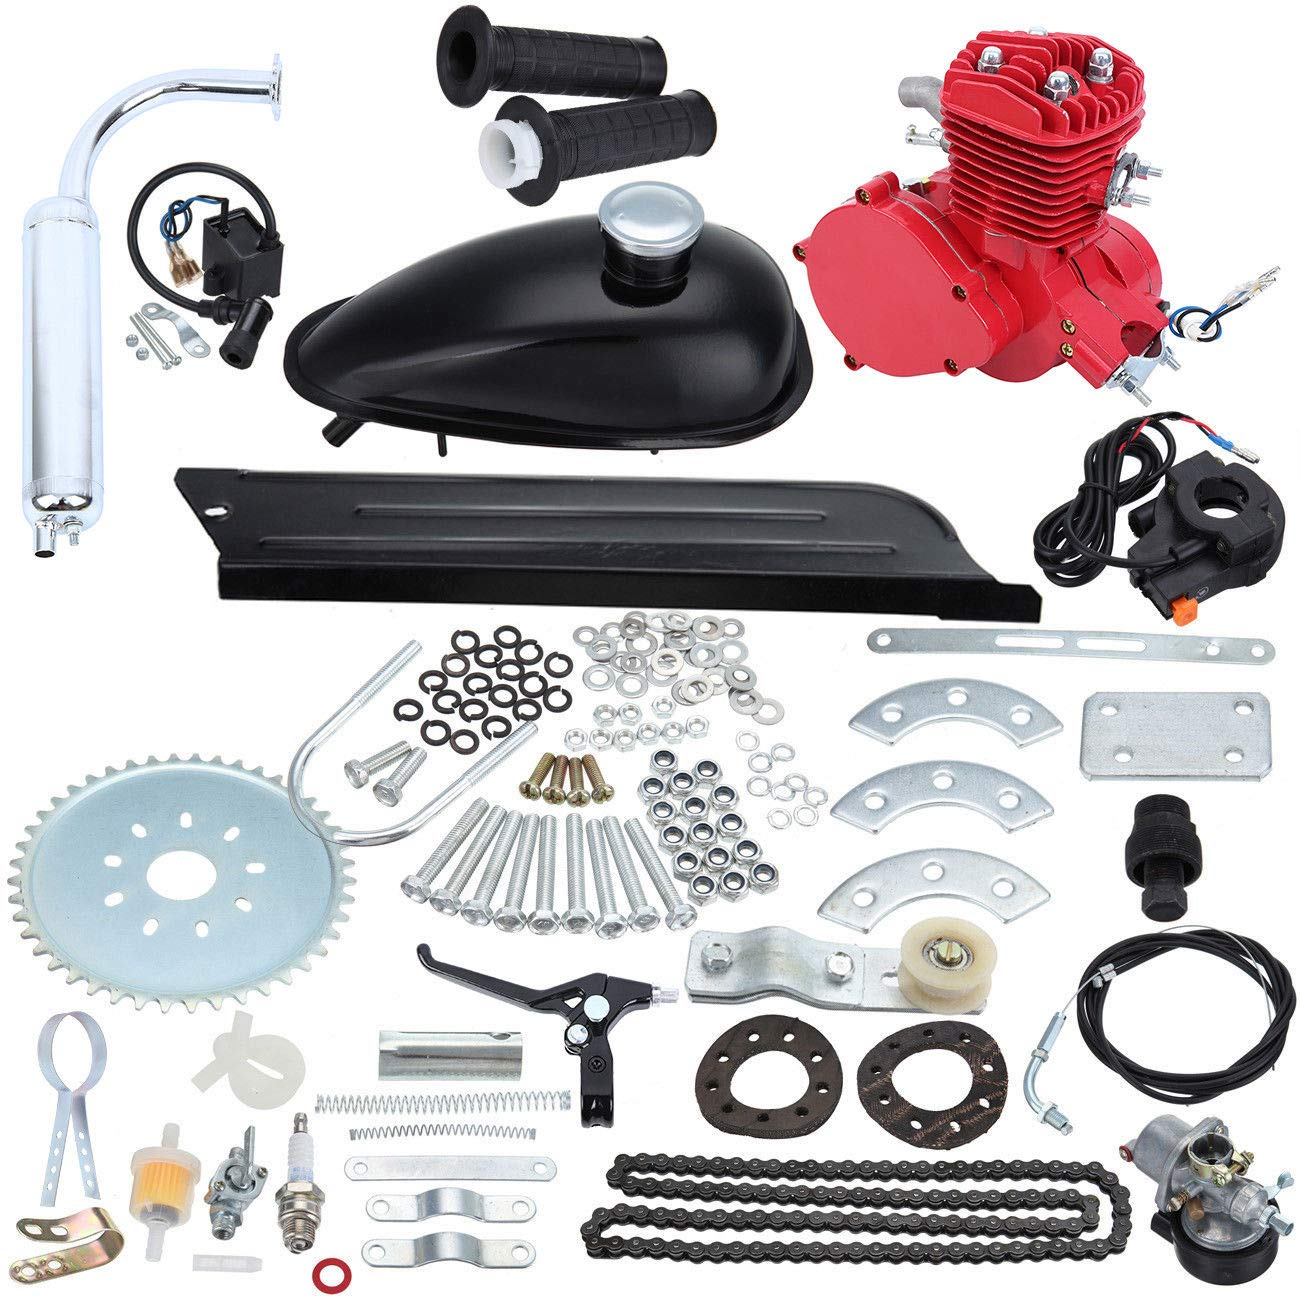 Ambienceo 80cc 2 Stroke Bicycle Engine Motor Gas Motorized Bike Motor Kit